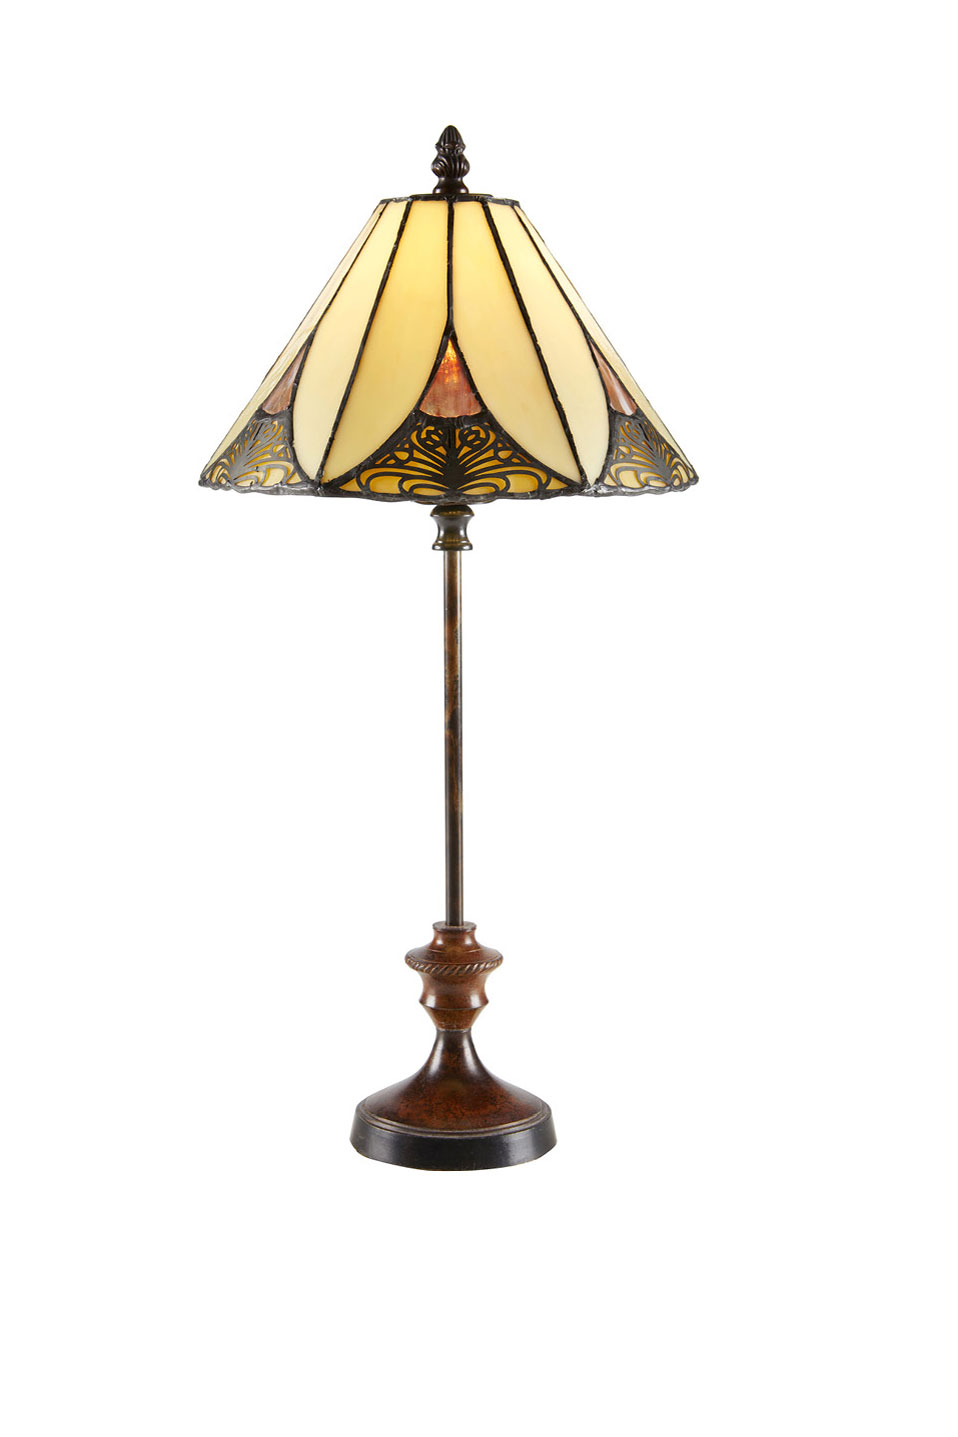 Petite lampe Art Déco Tiffany. Artistar.